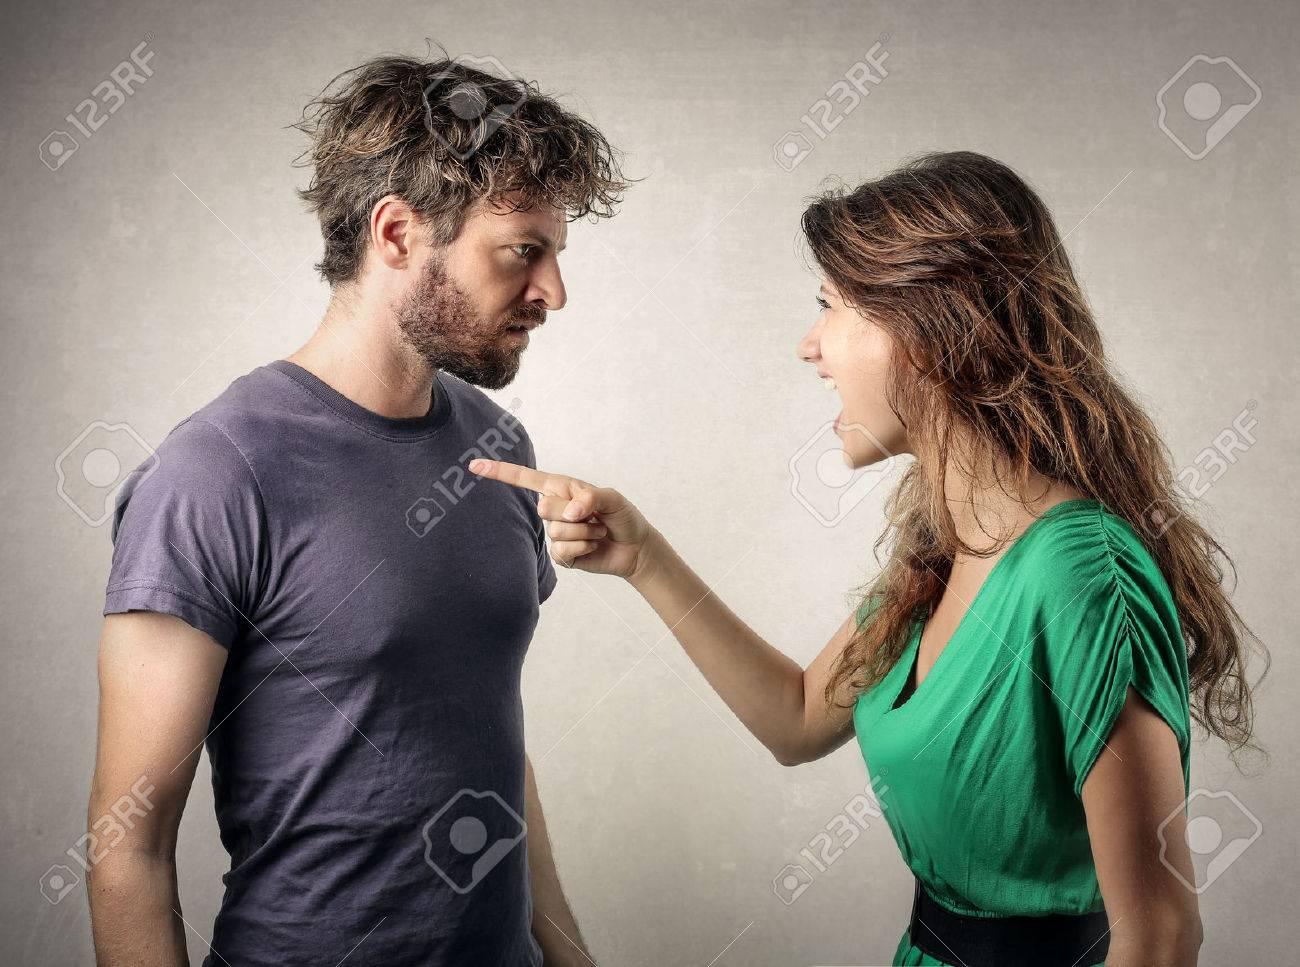 Couple in a fight Standard-Bild - 59115070